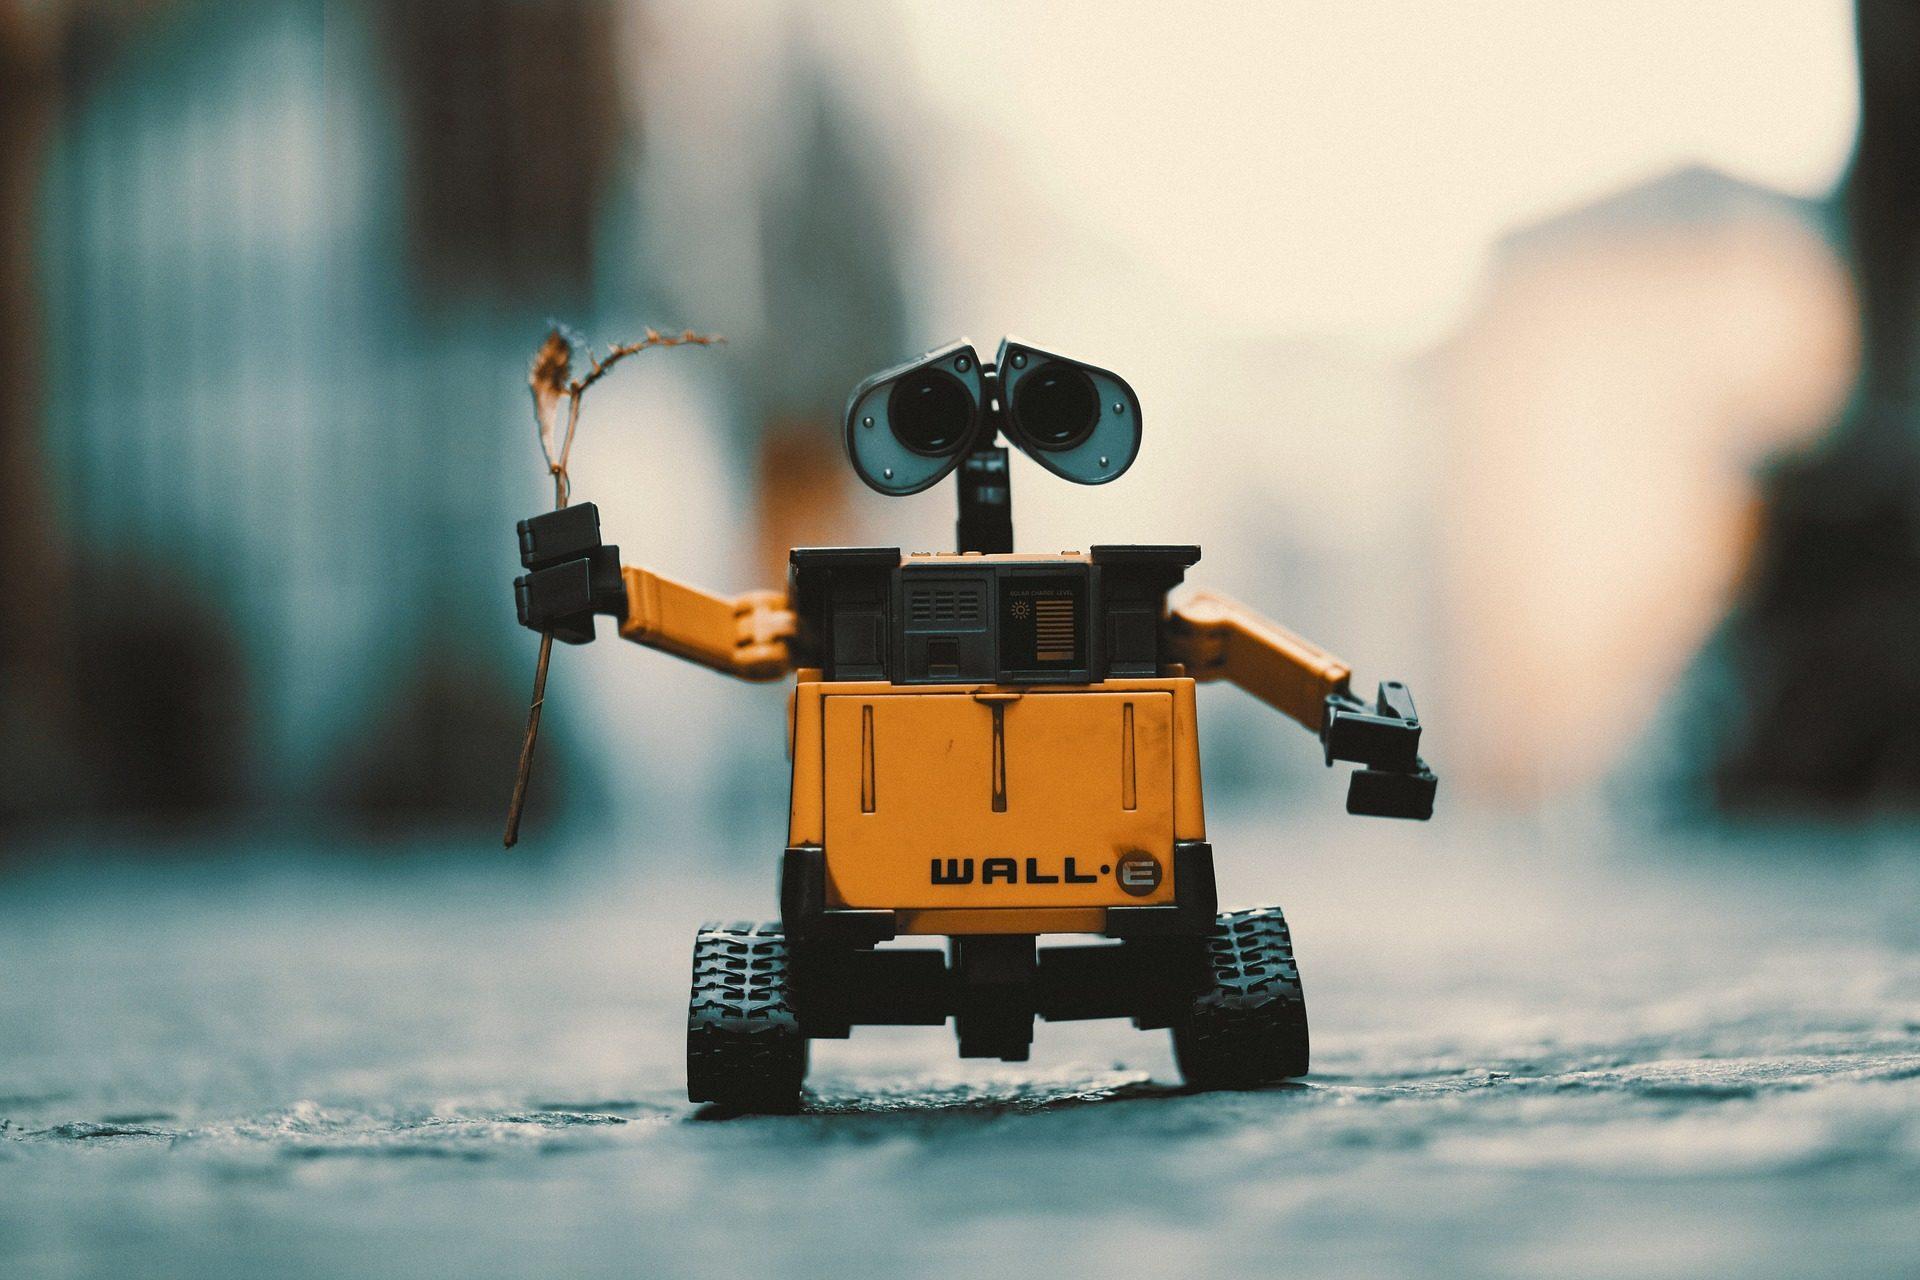 robot, Walle, Giocattolo, ramo, regalo - Sfondi HD - Professor-falken.com